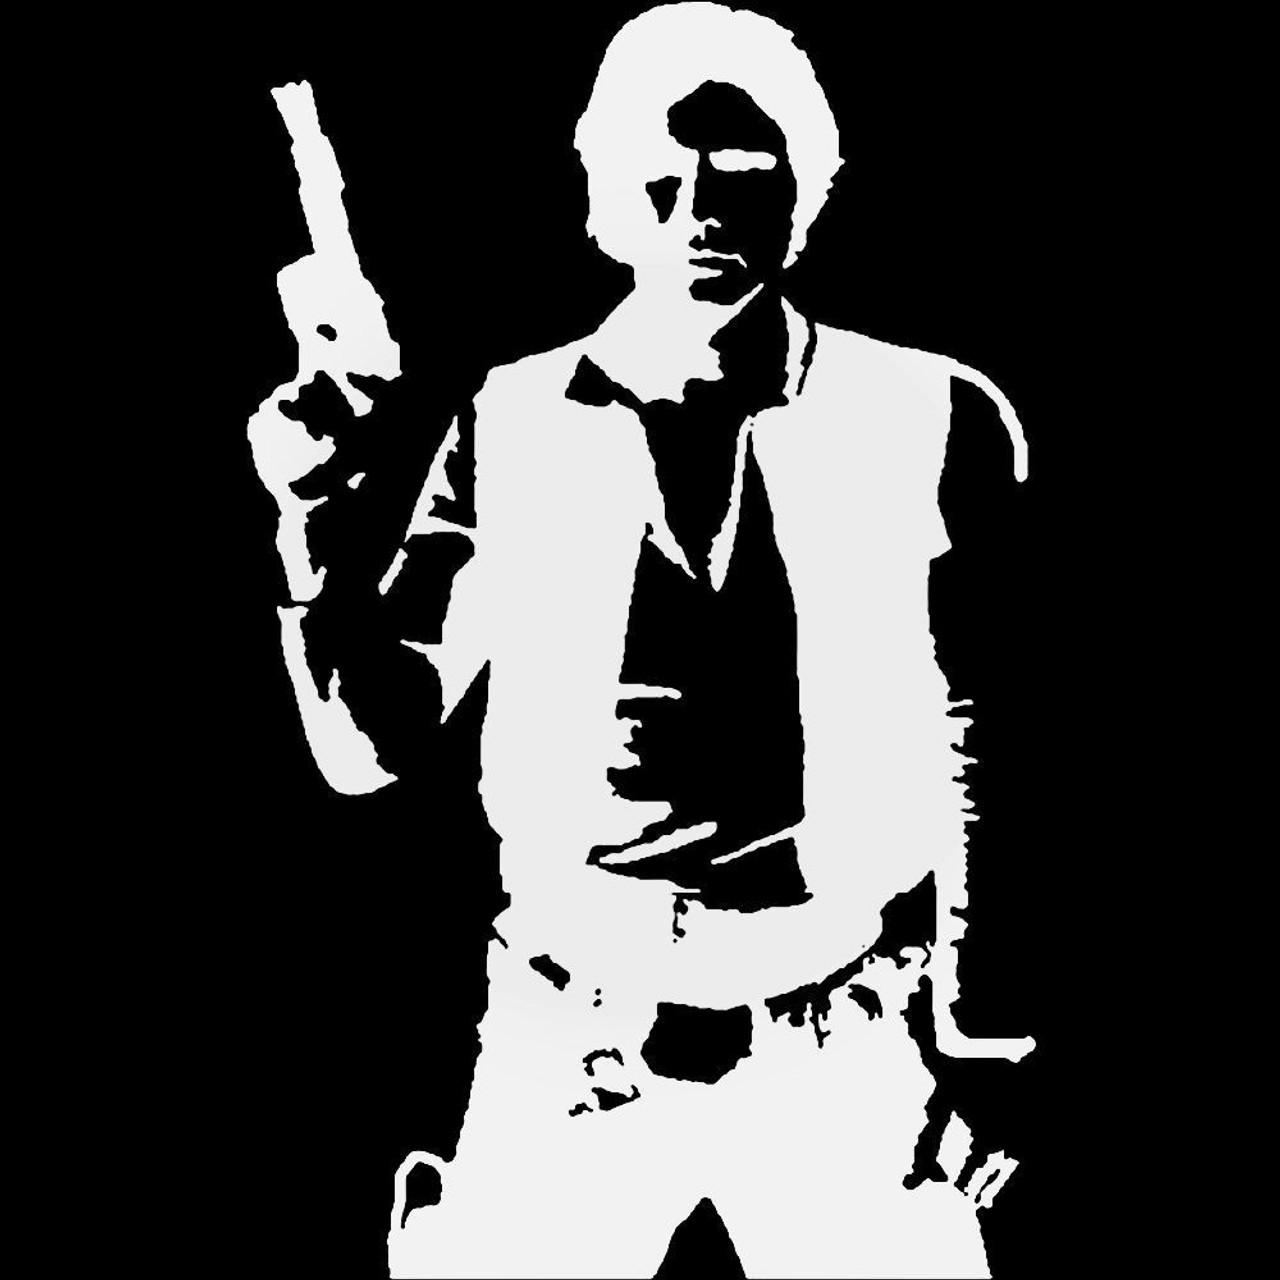 Star Wars-Death Star v1 Decal FREE US SHIPPING